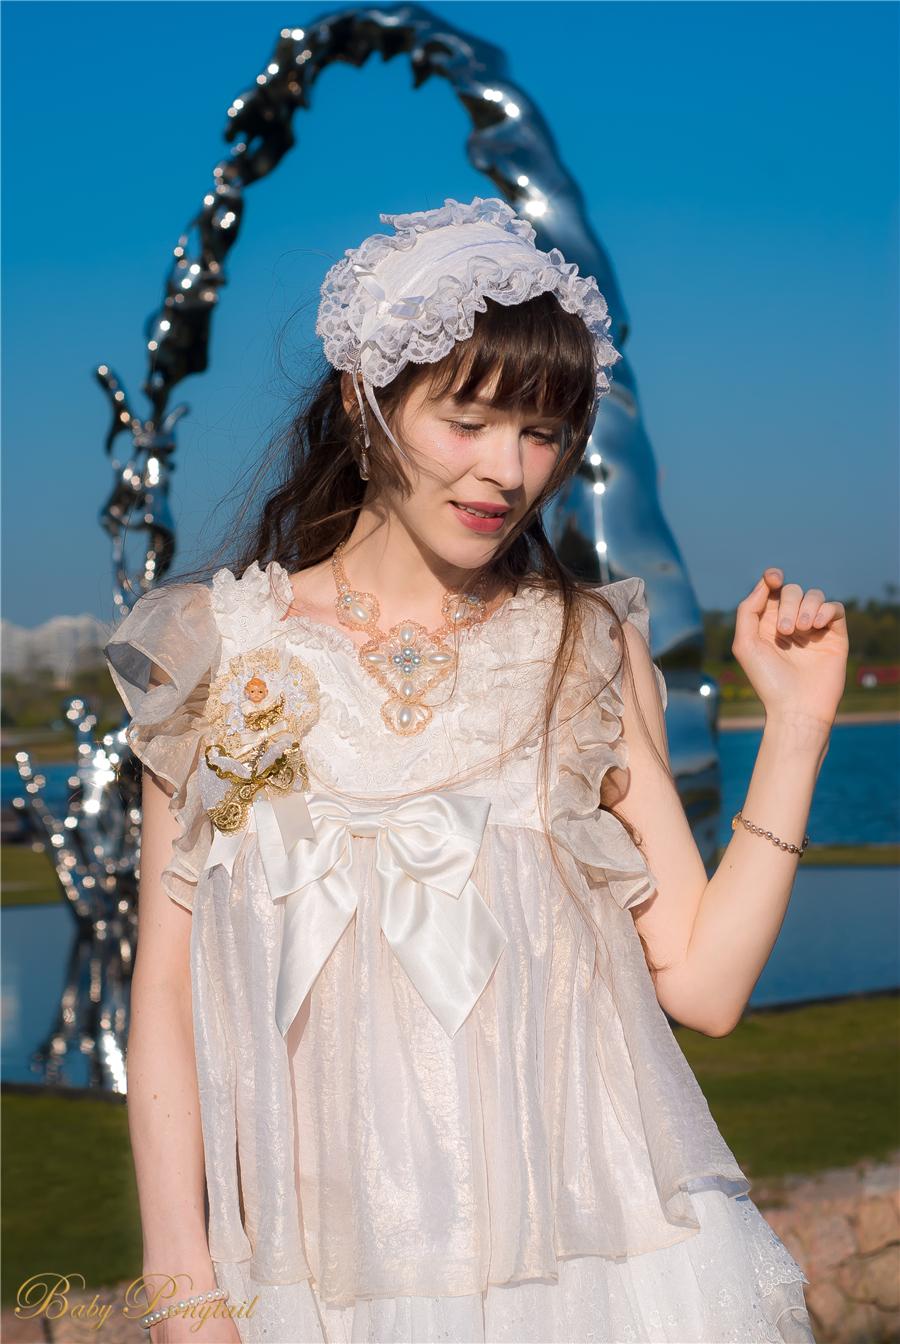 BabyPonytail_modelclaudia_Present Angel White JSK park03.jpg